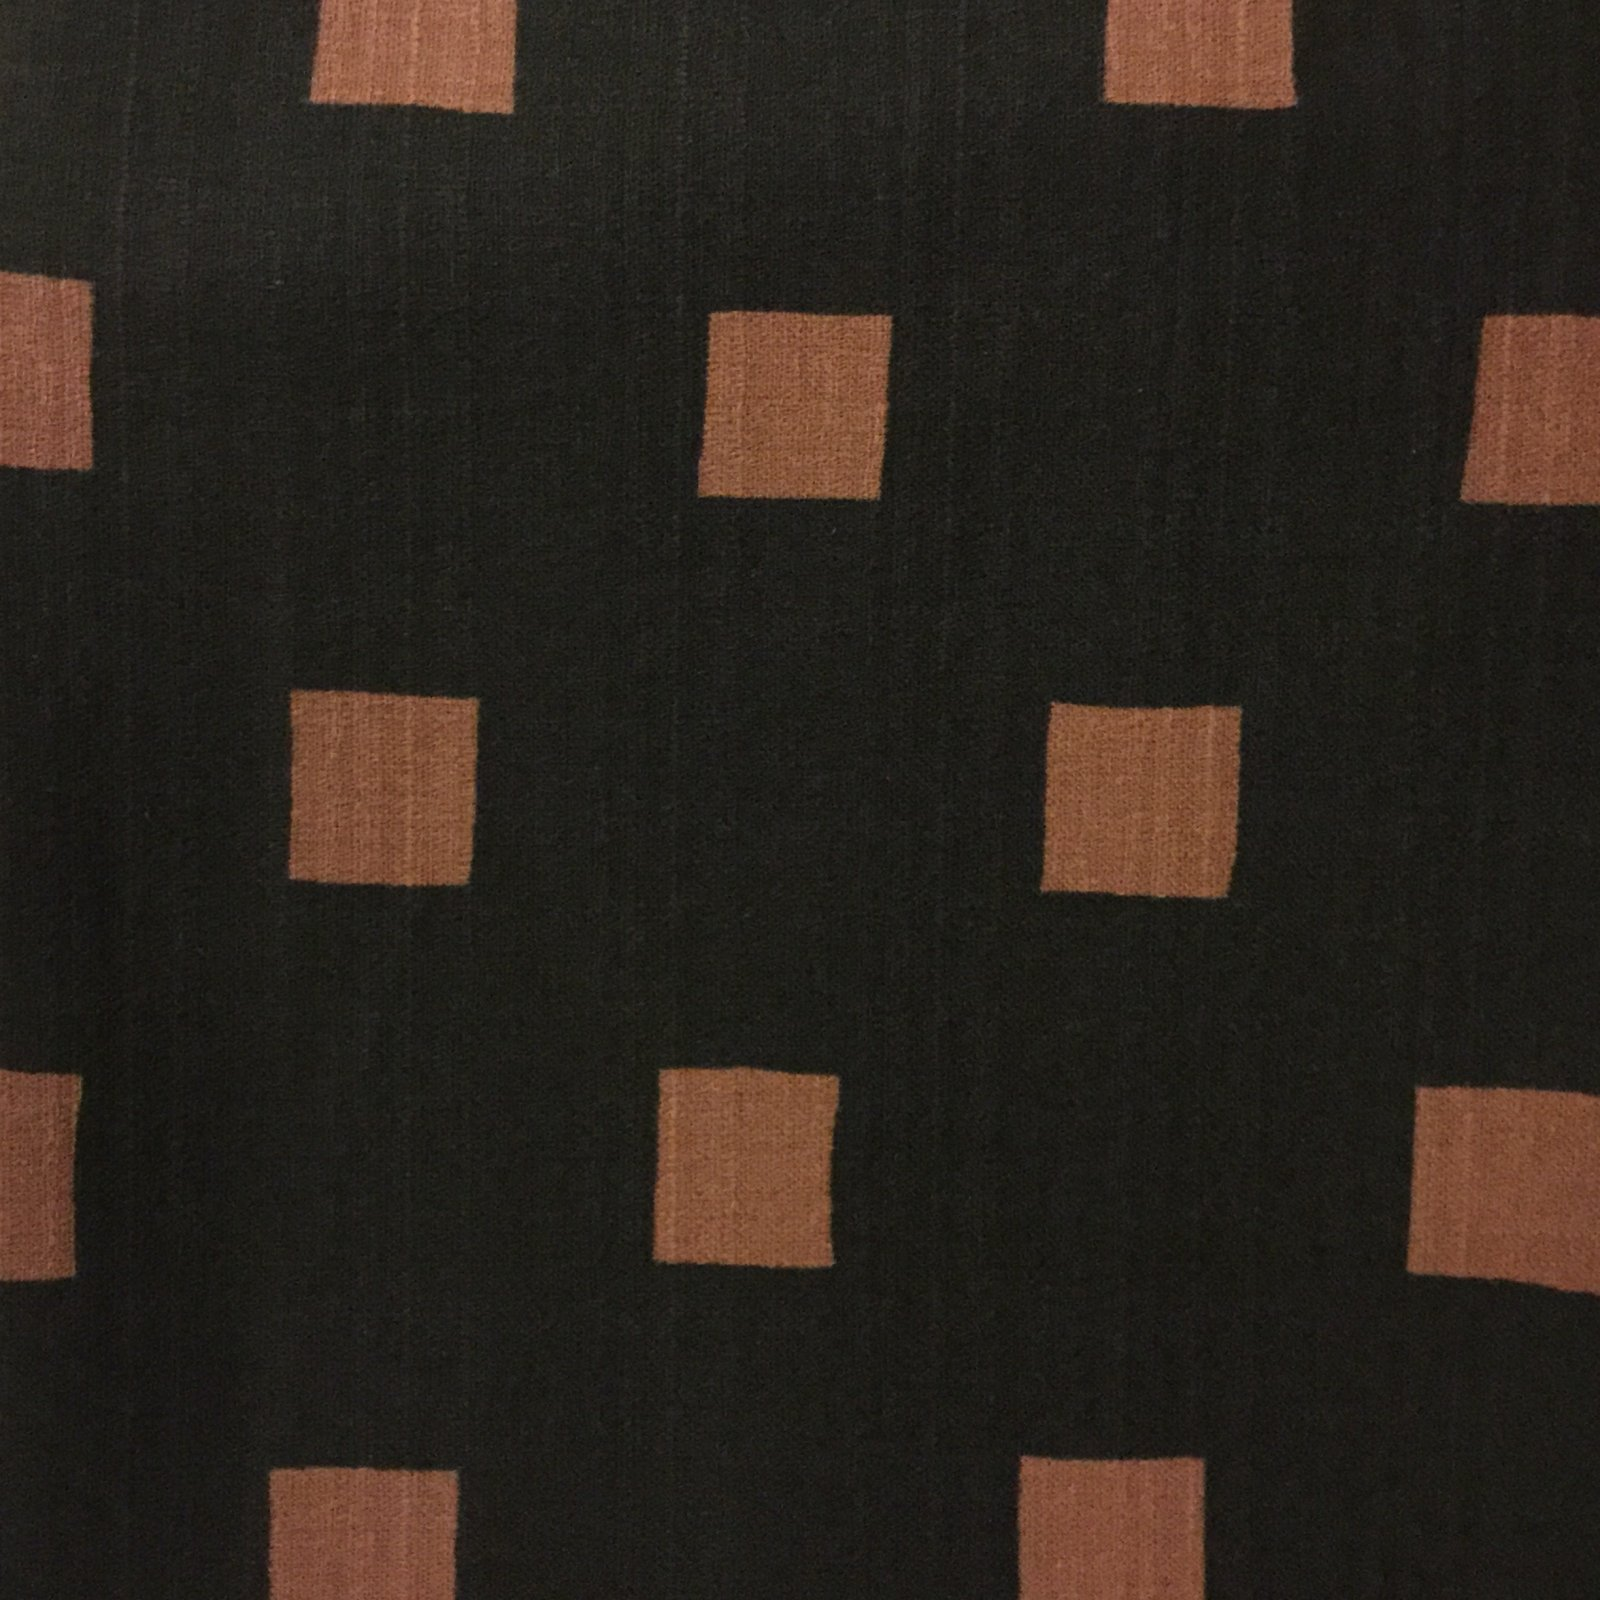 Hokkoh - Bark Cloth - Squares - Black/Chocolate